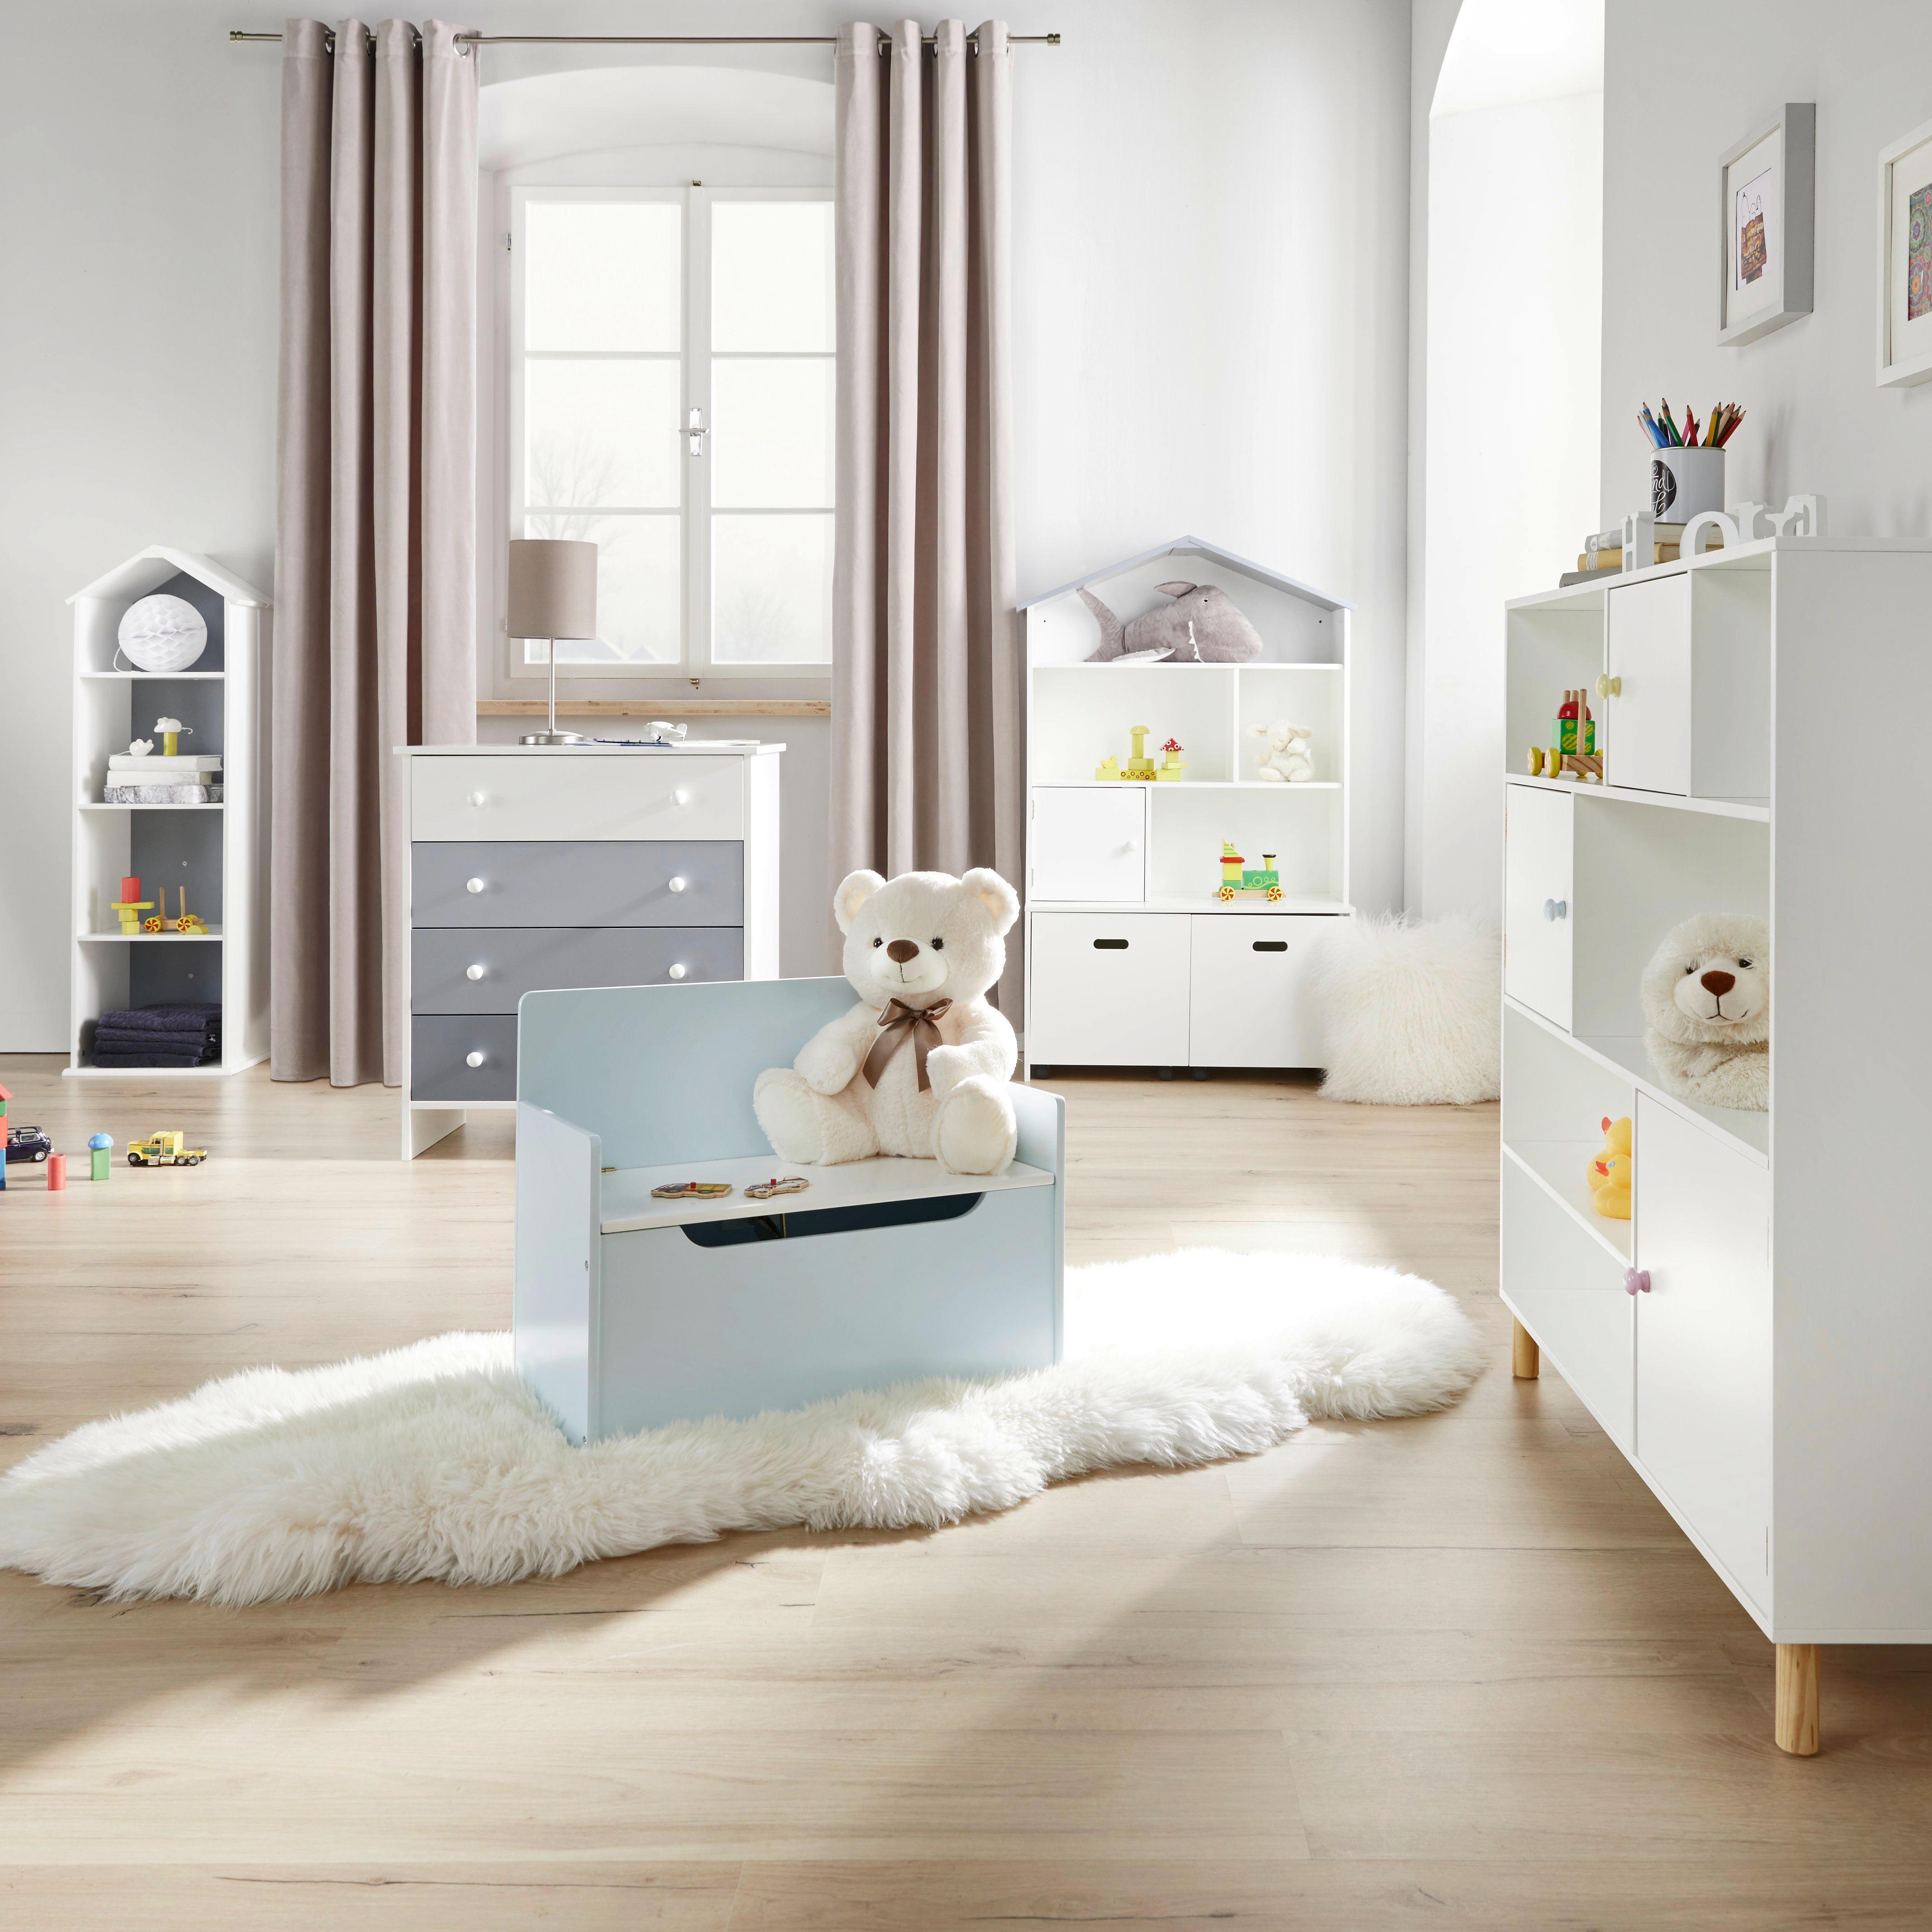 Kinderzimmer entdecken | mömax